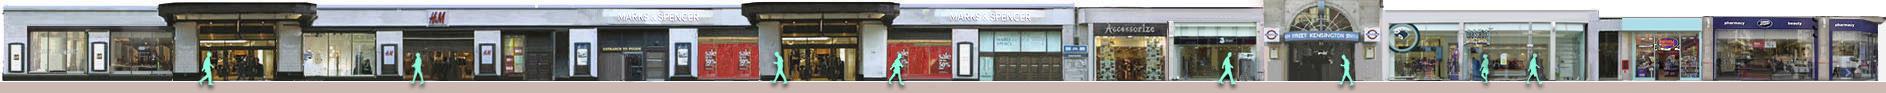 Kensington High Street shops